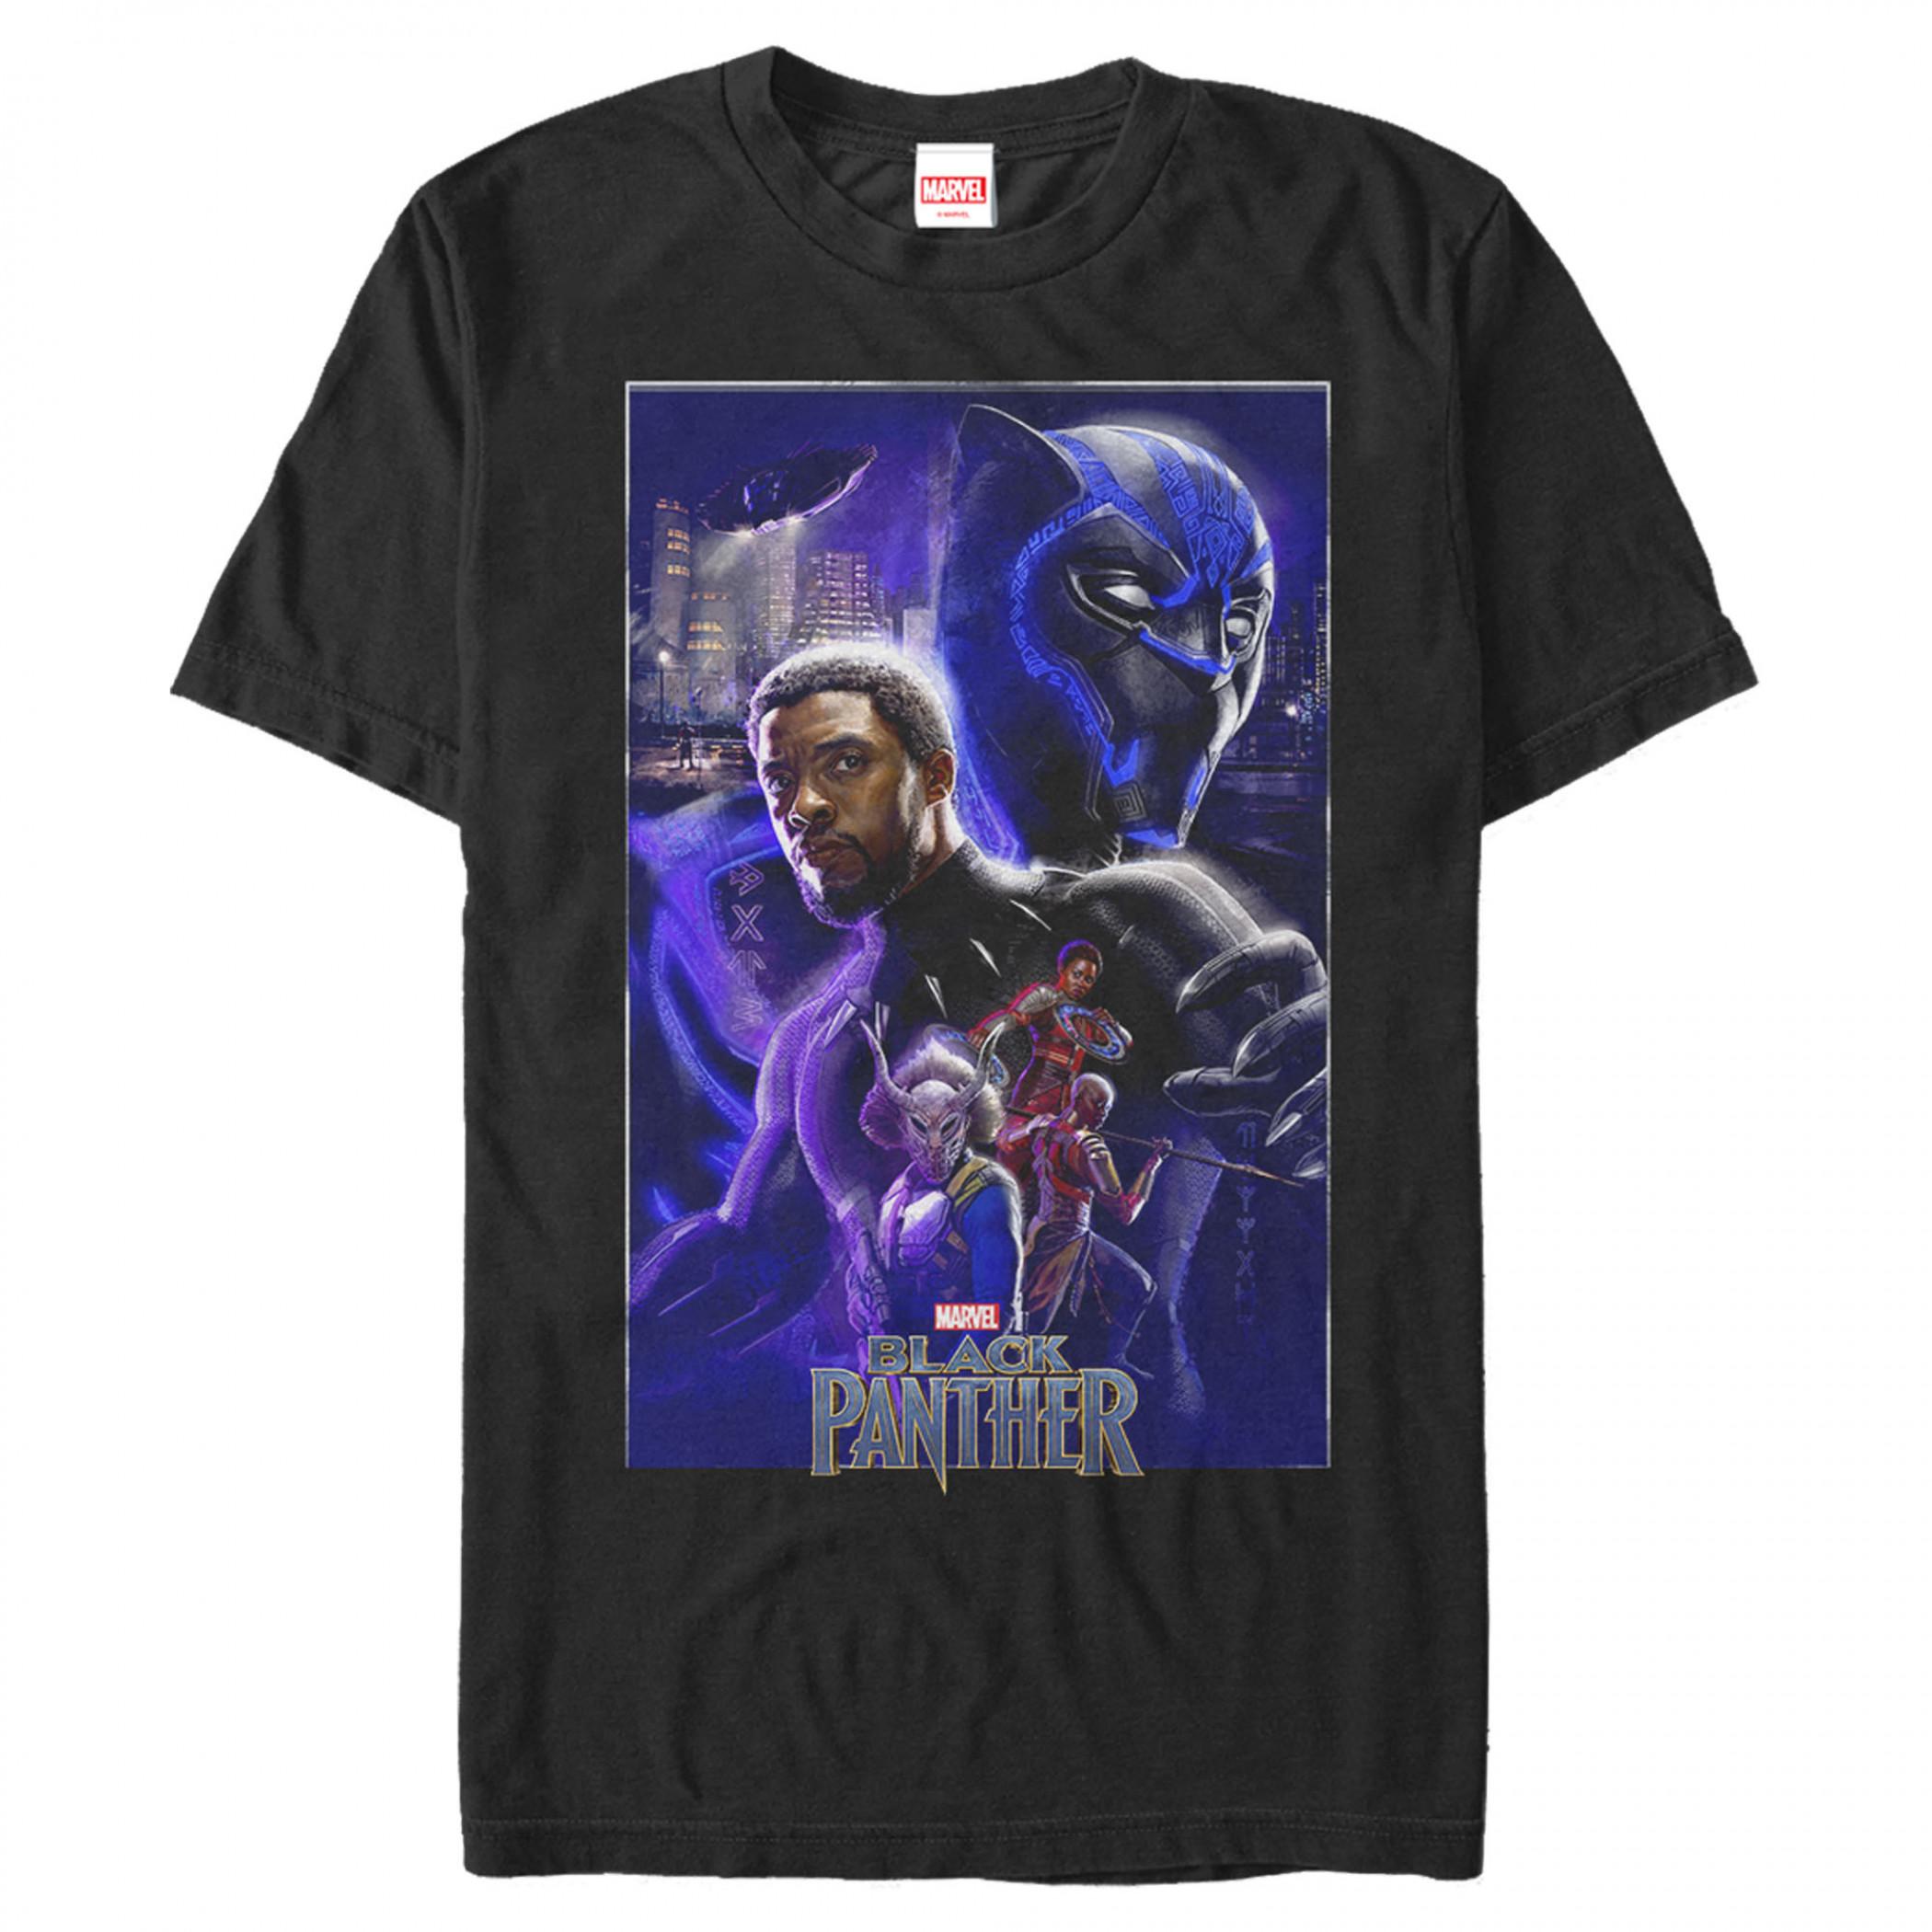 Black Panther Marvel Movie Poster T-Shirt